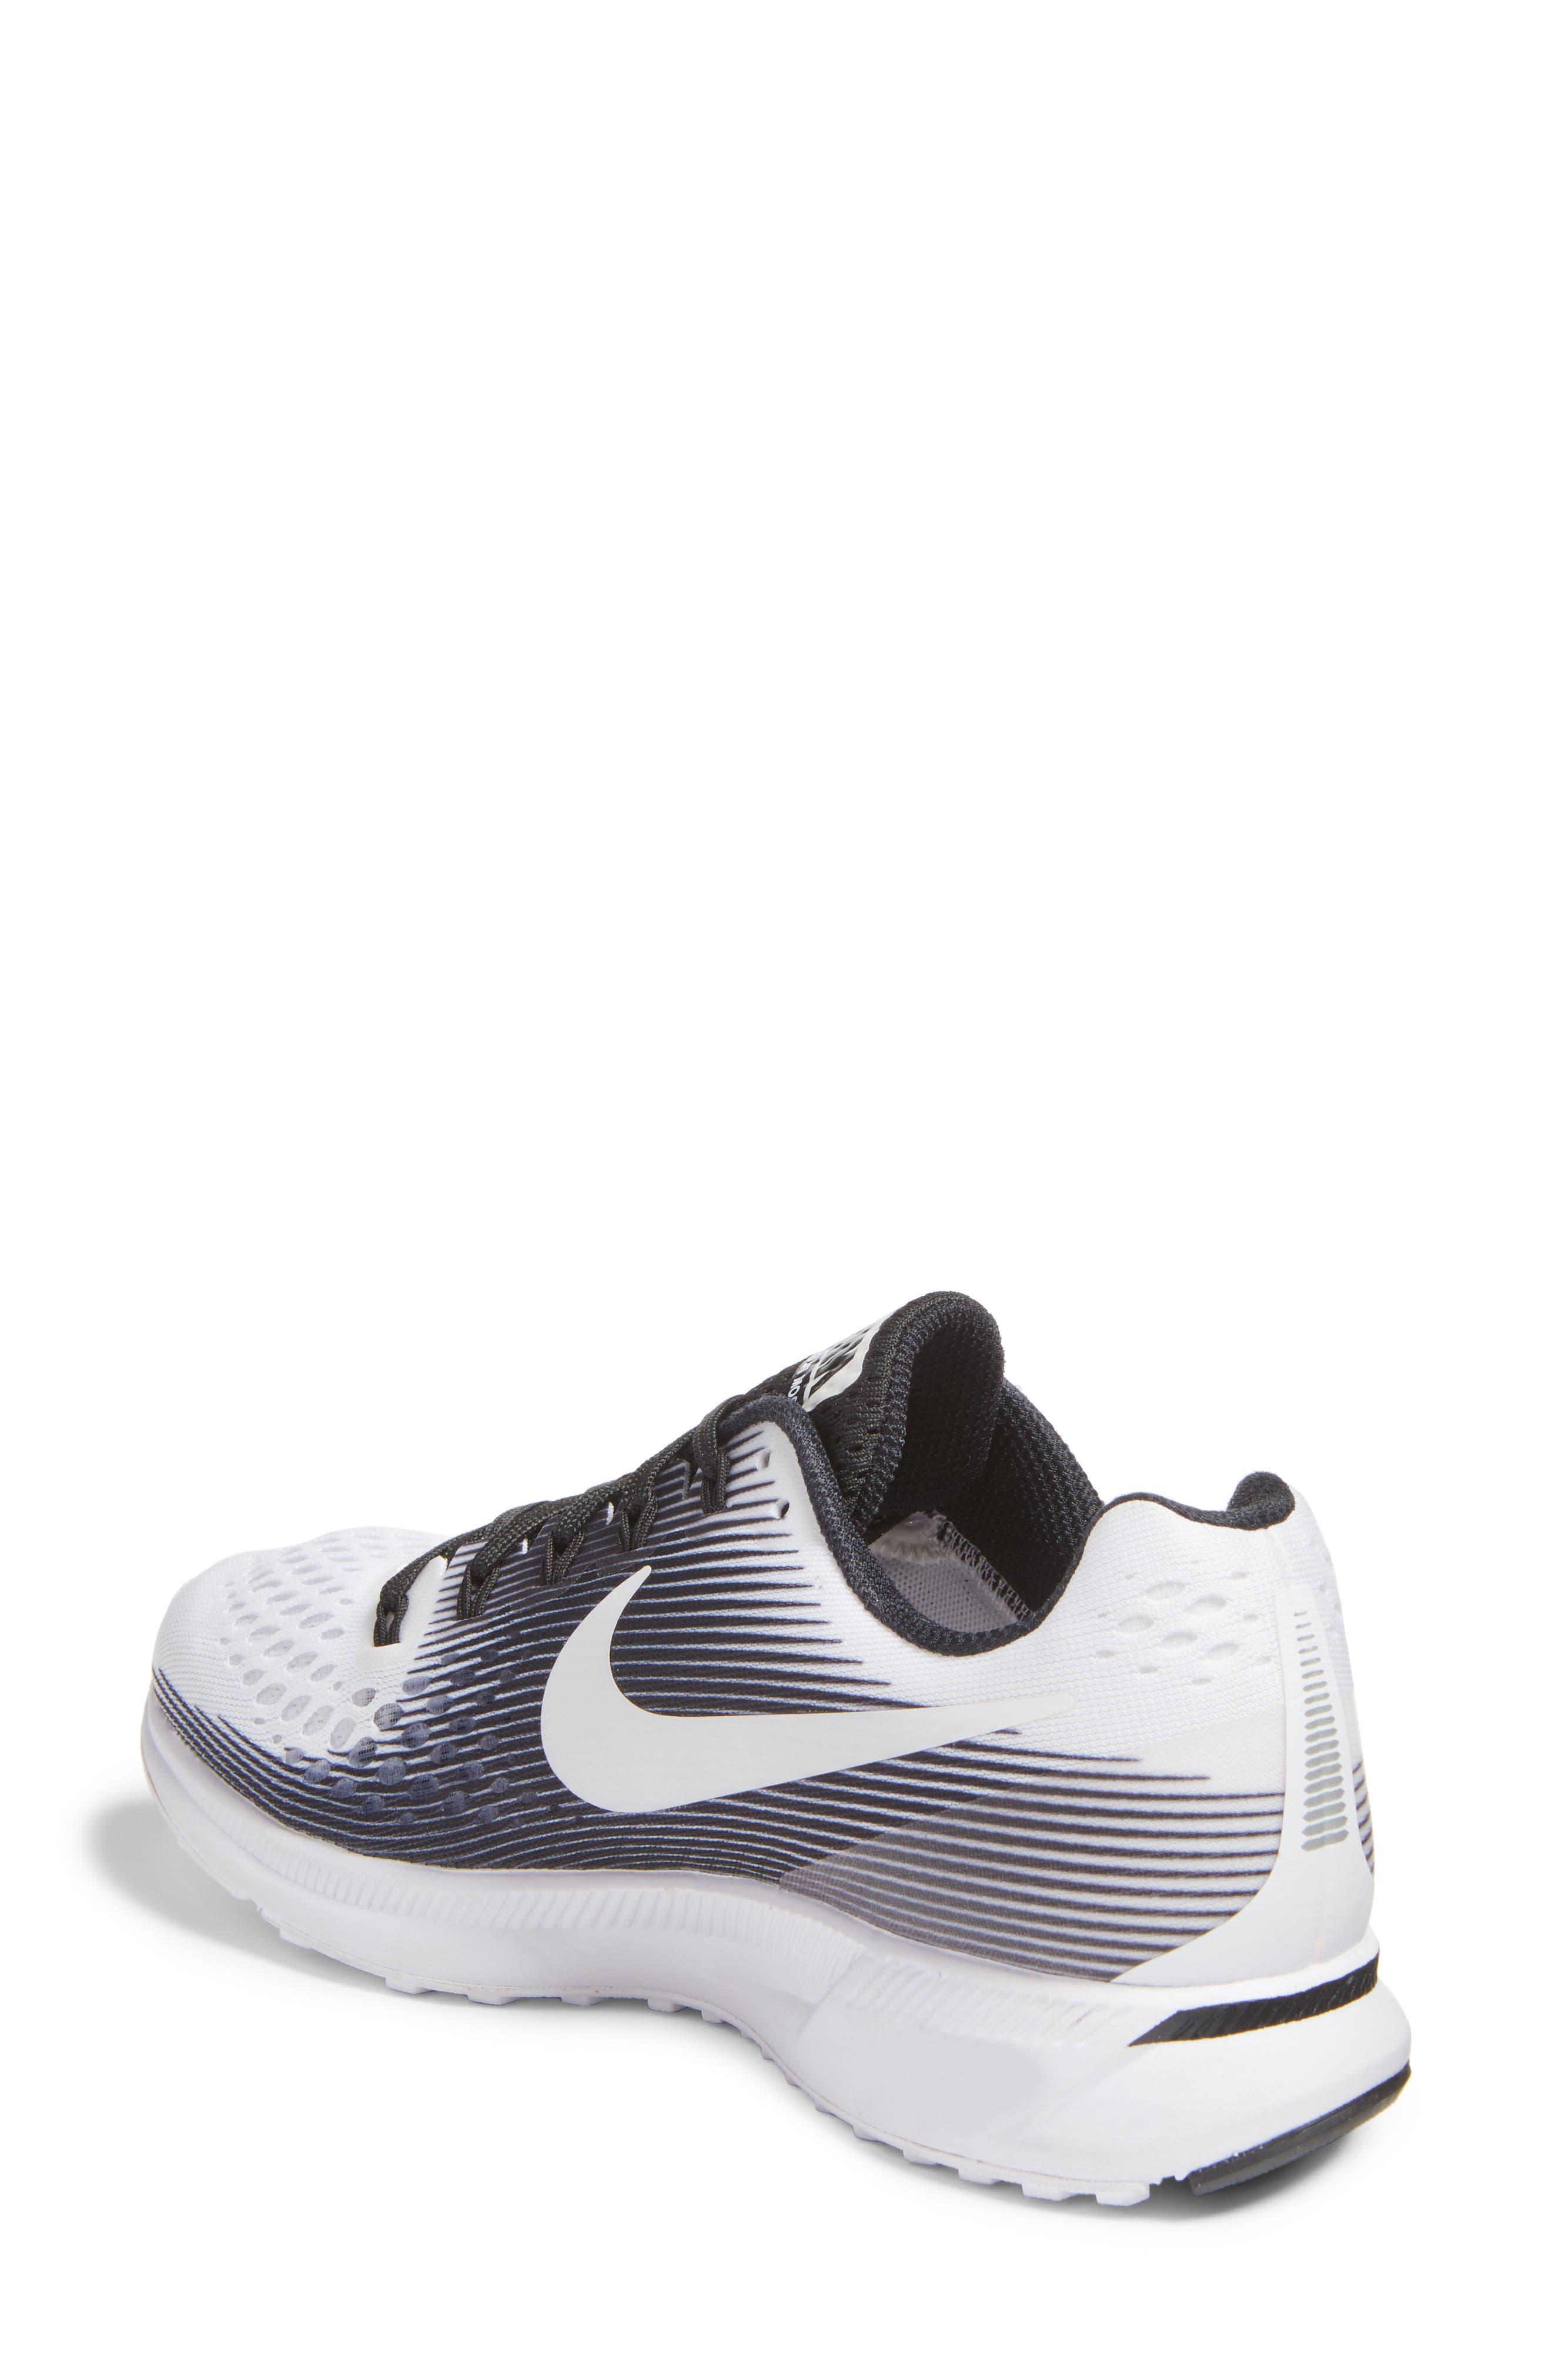 Air Zoom Pegasus 34 LE Running Shoe,                             Alternate thumbnail 3, color,                             White/ White/ Black